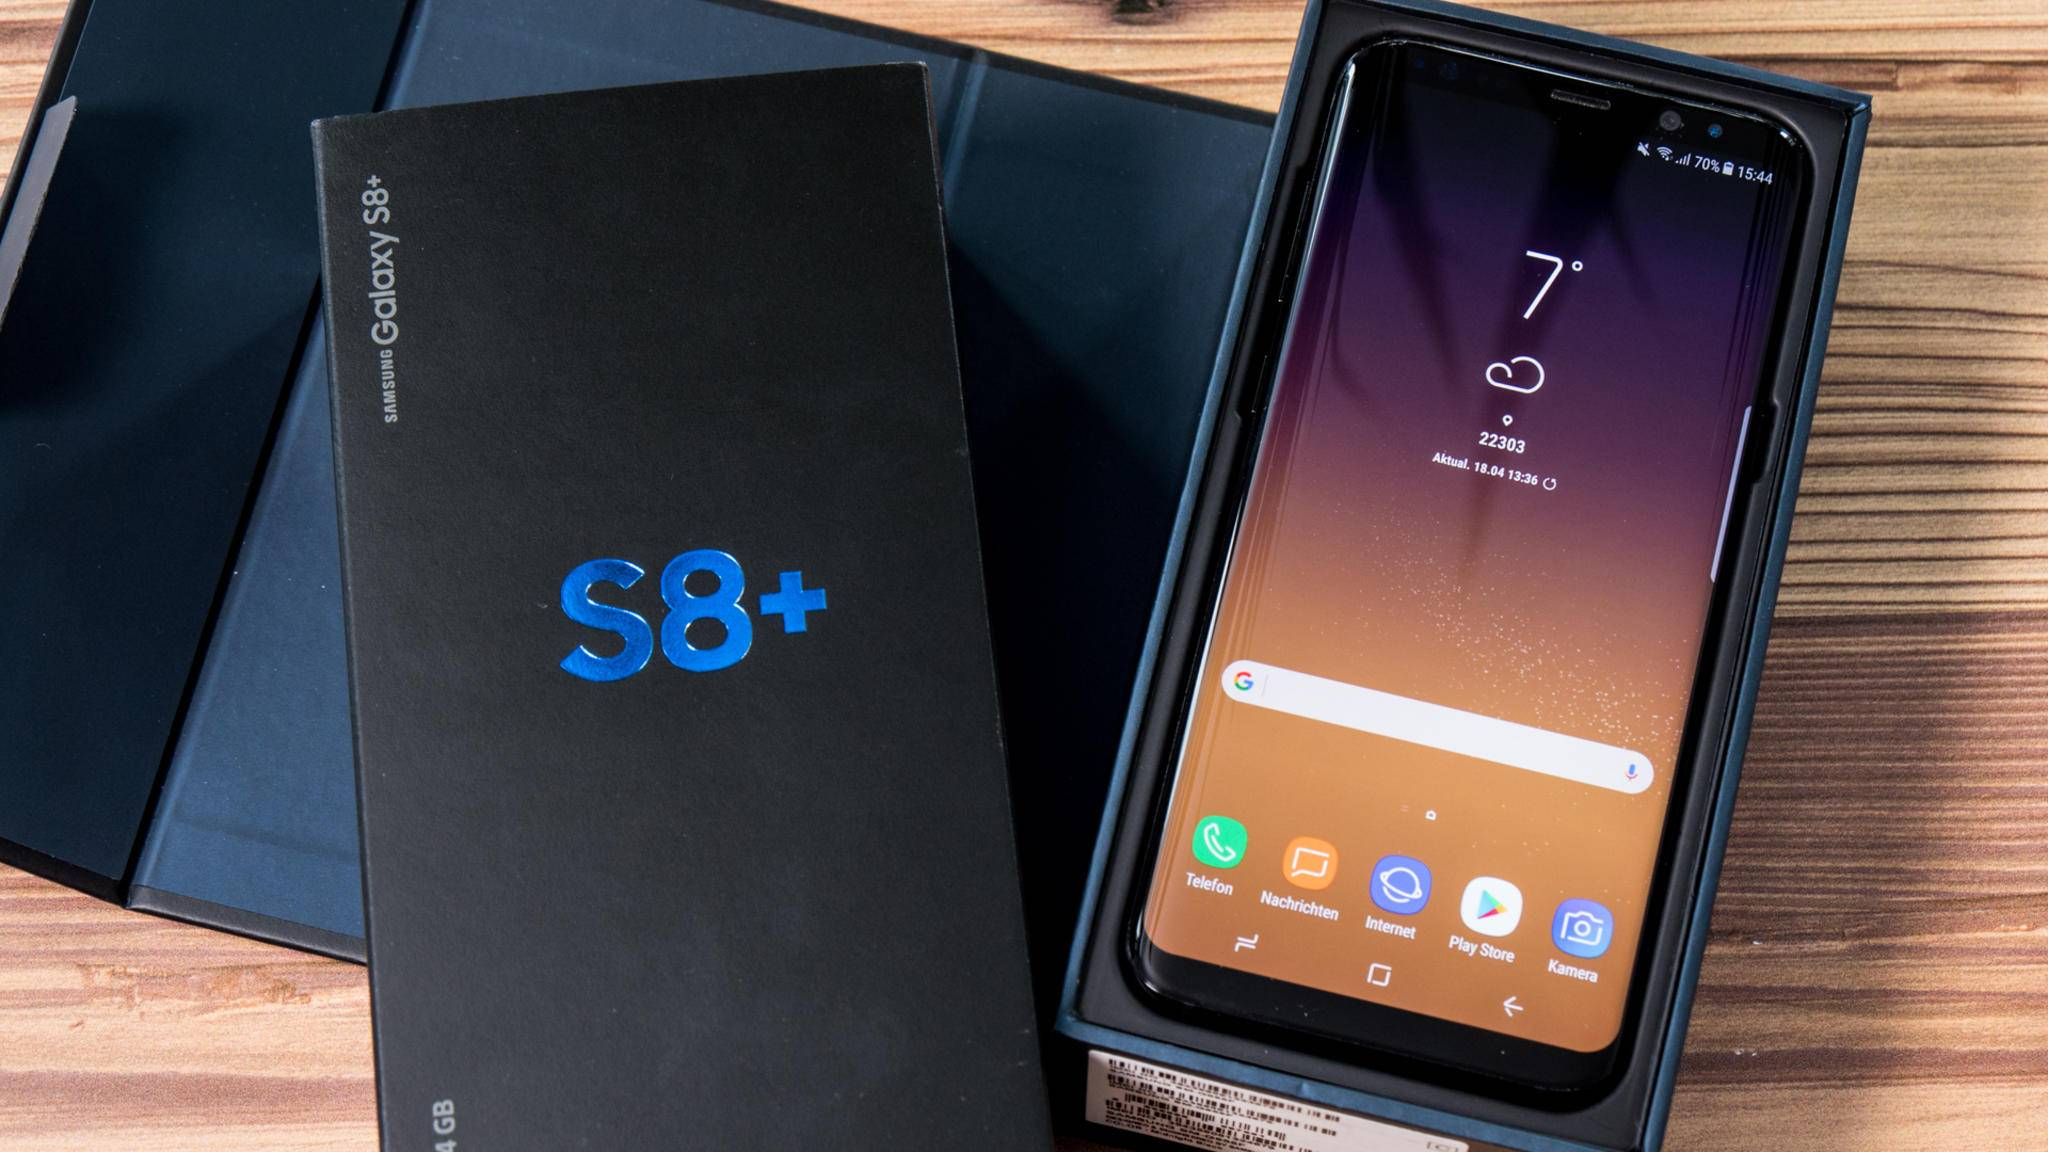 Der Fingerabdrucksensor des Galaxy S8 kann den Windows-10-PC entsperren.